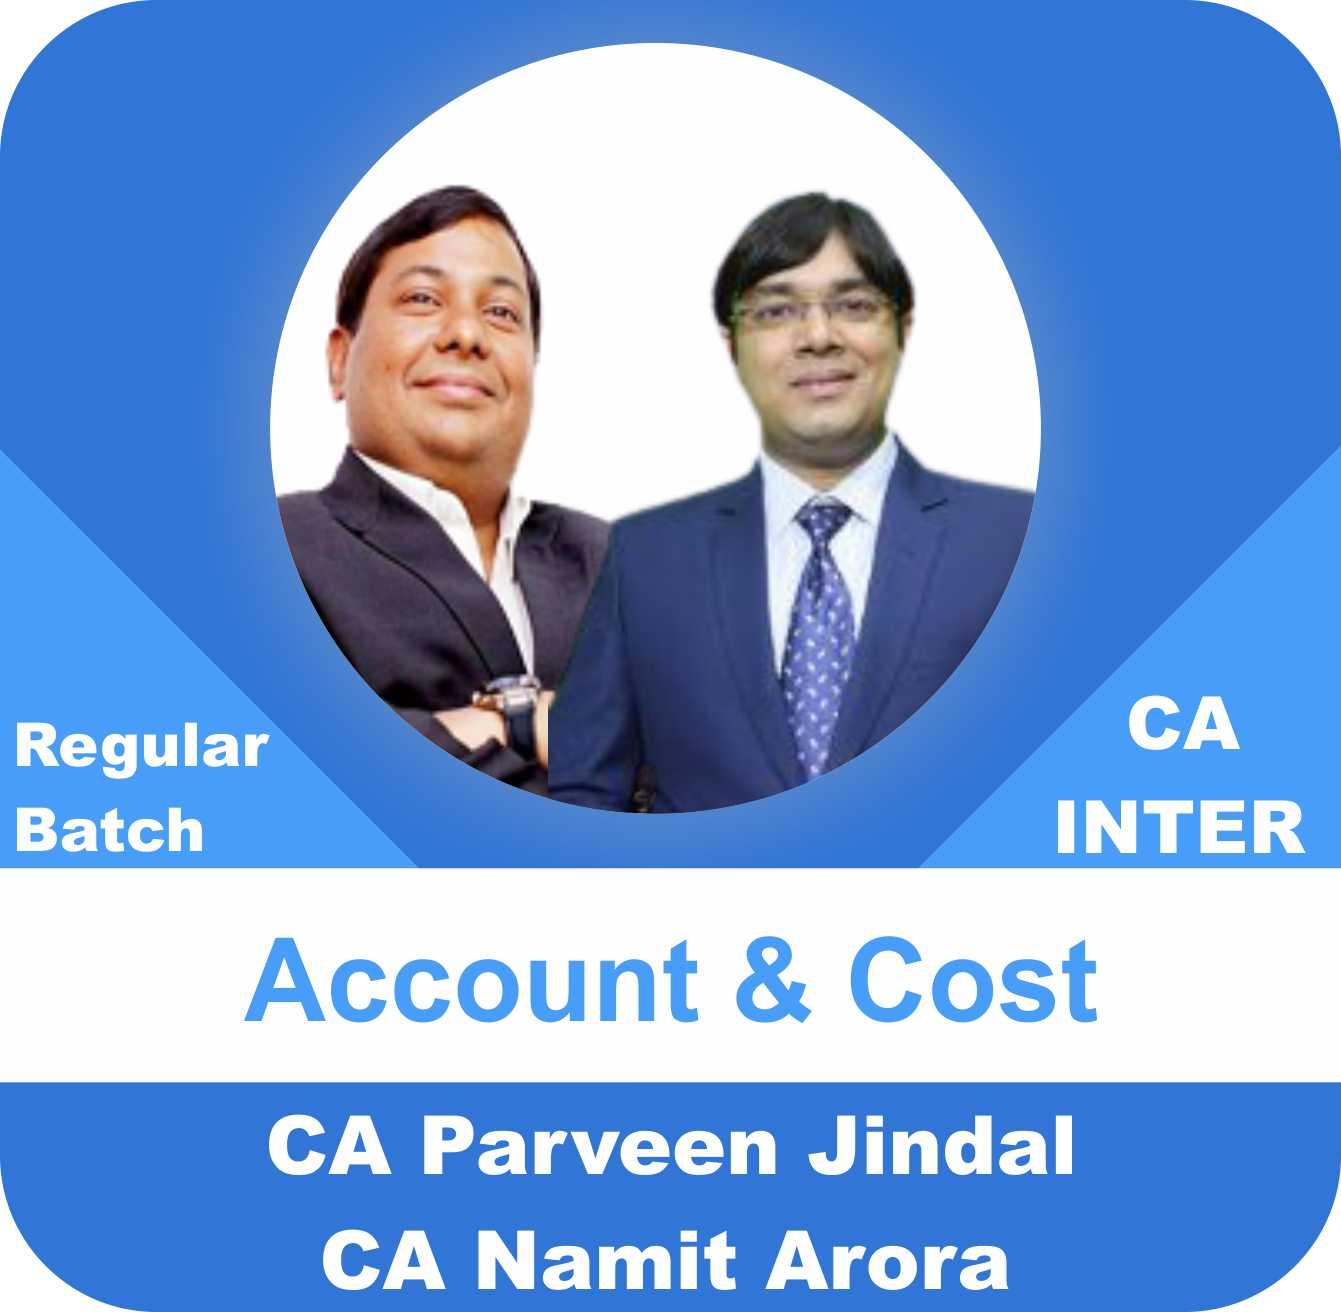 Account & Cost Regular Batch Combo